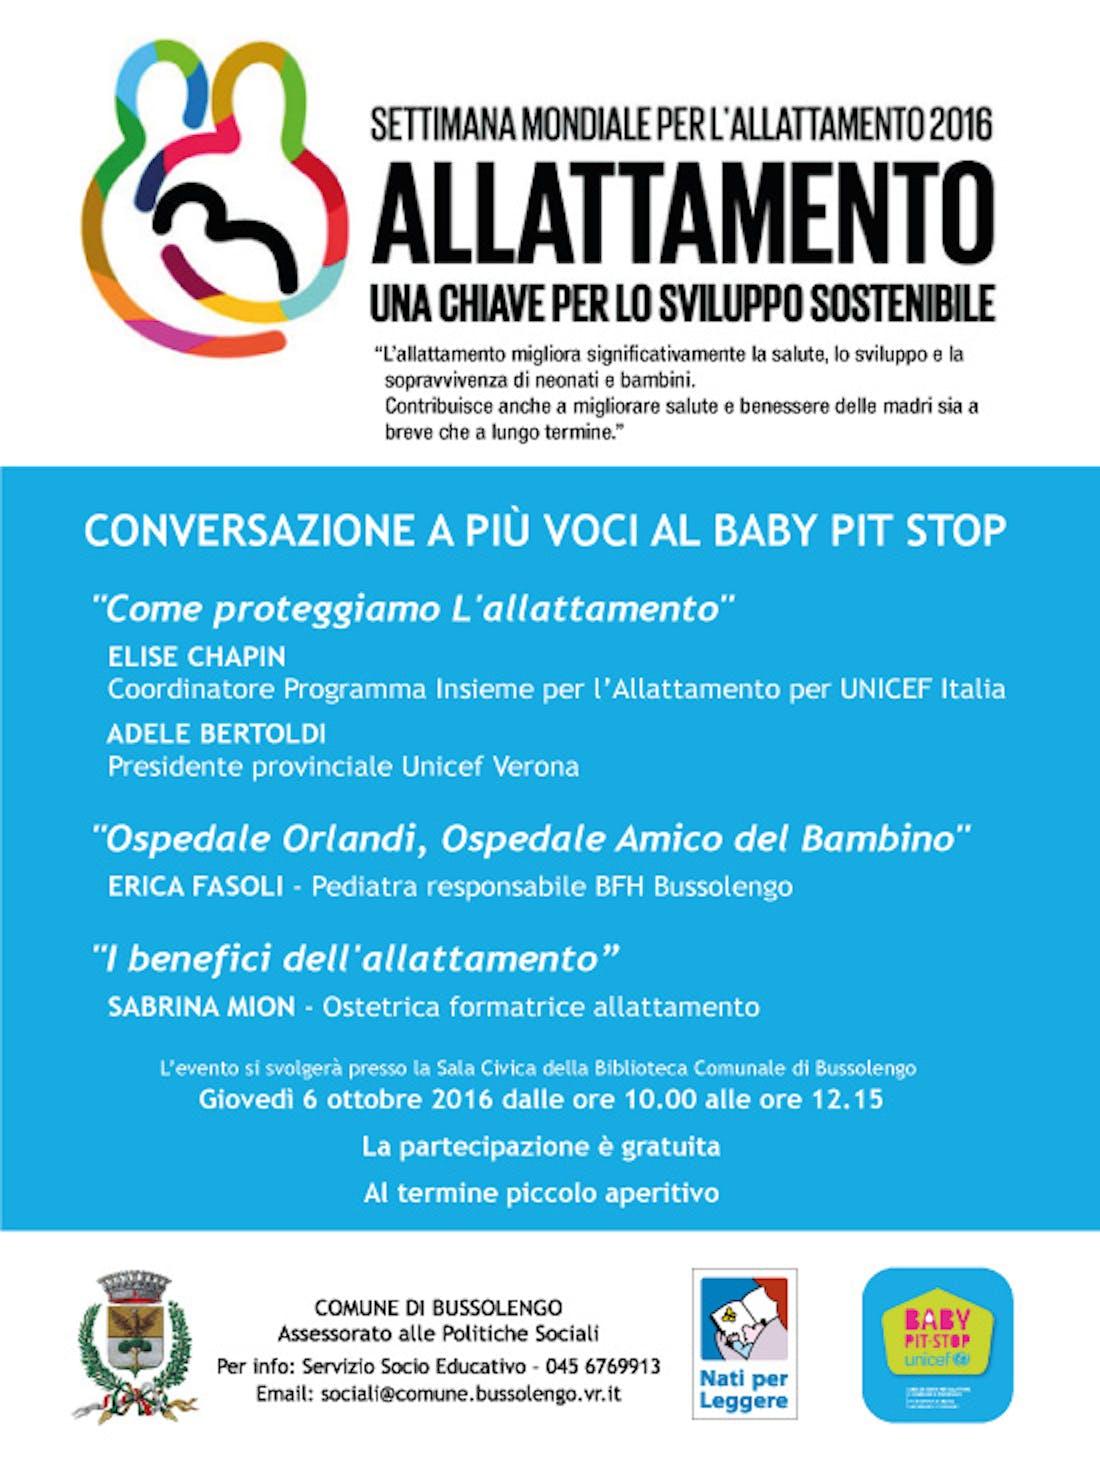 Conversazione a più voci al Baby Pit Stop di Bussolengo